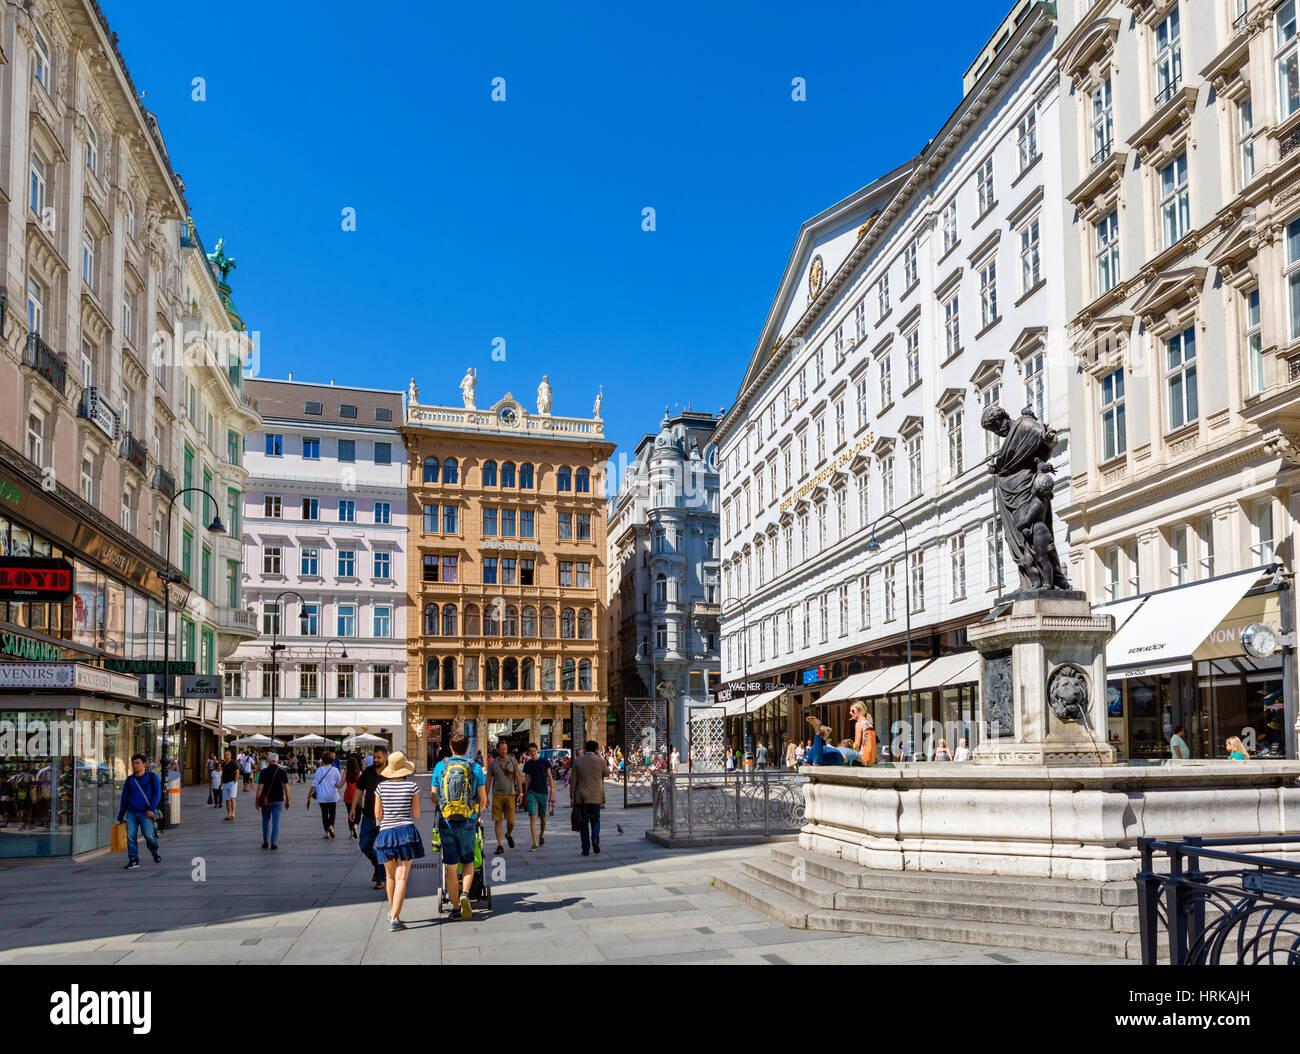 Shops on the Graben, Innere Stadt, Vienna, Austria - Stock Image